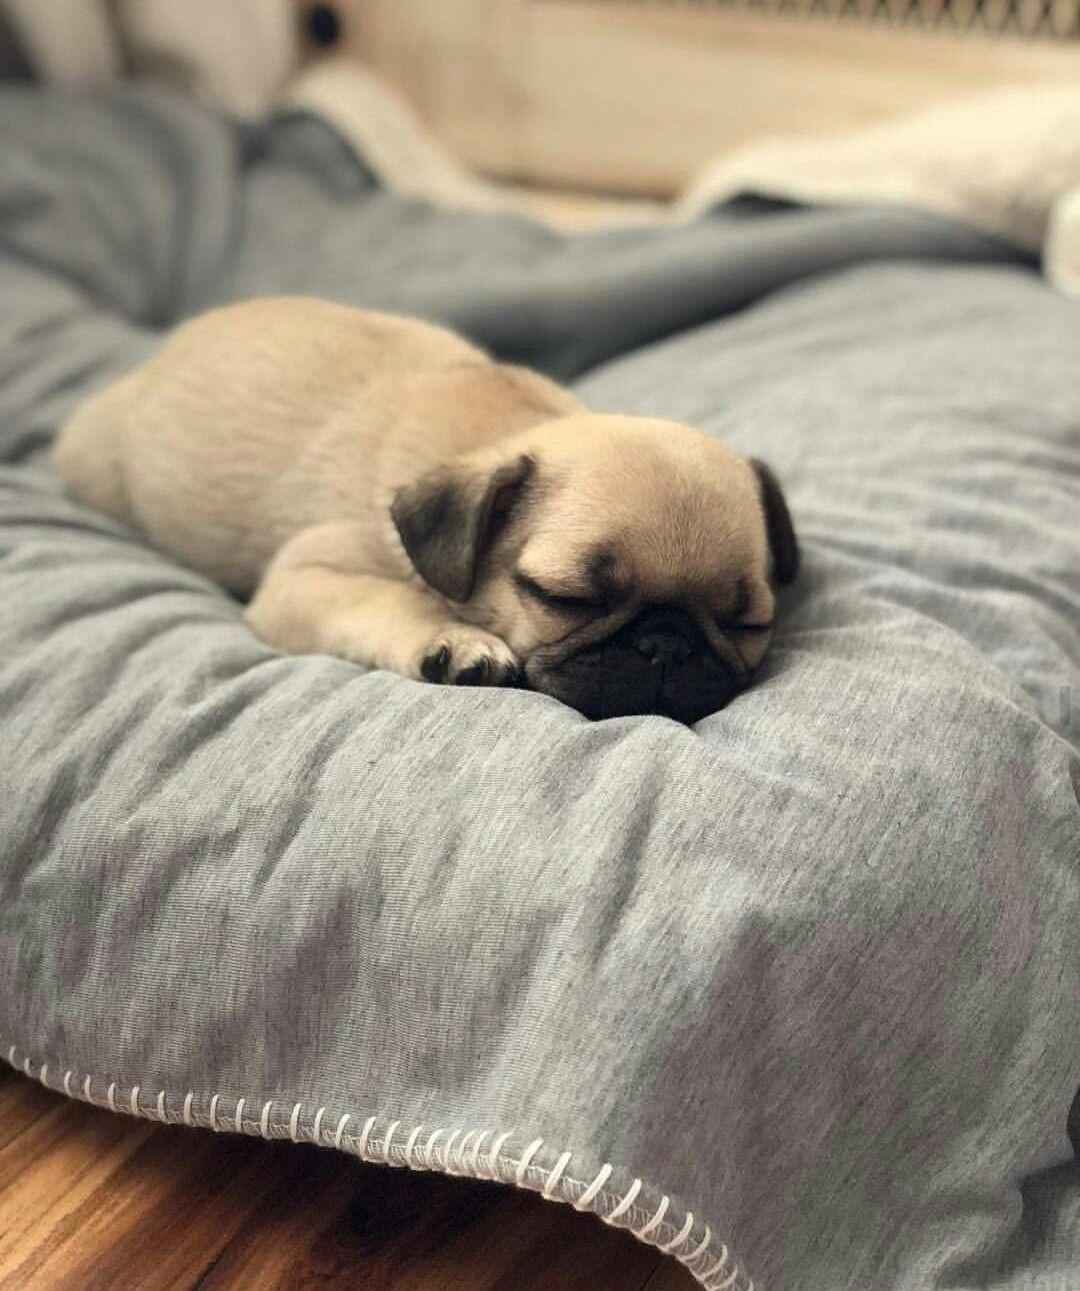 Sleep Tight Baby Boy Cute Baby Pugs Baby Pugs Pug Puppies